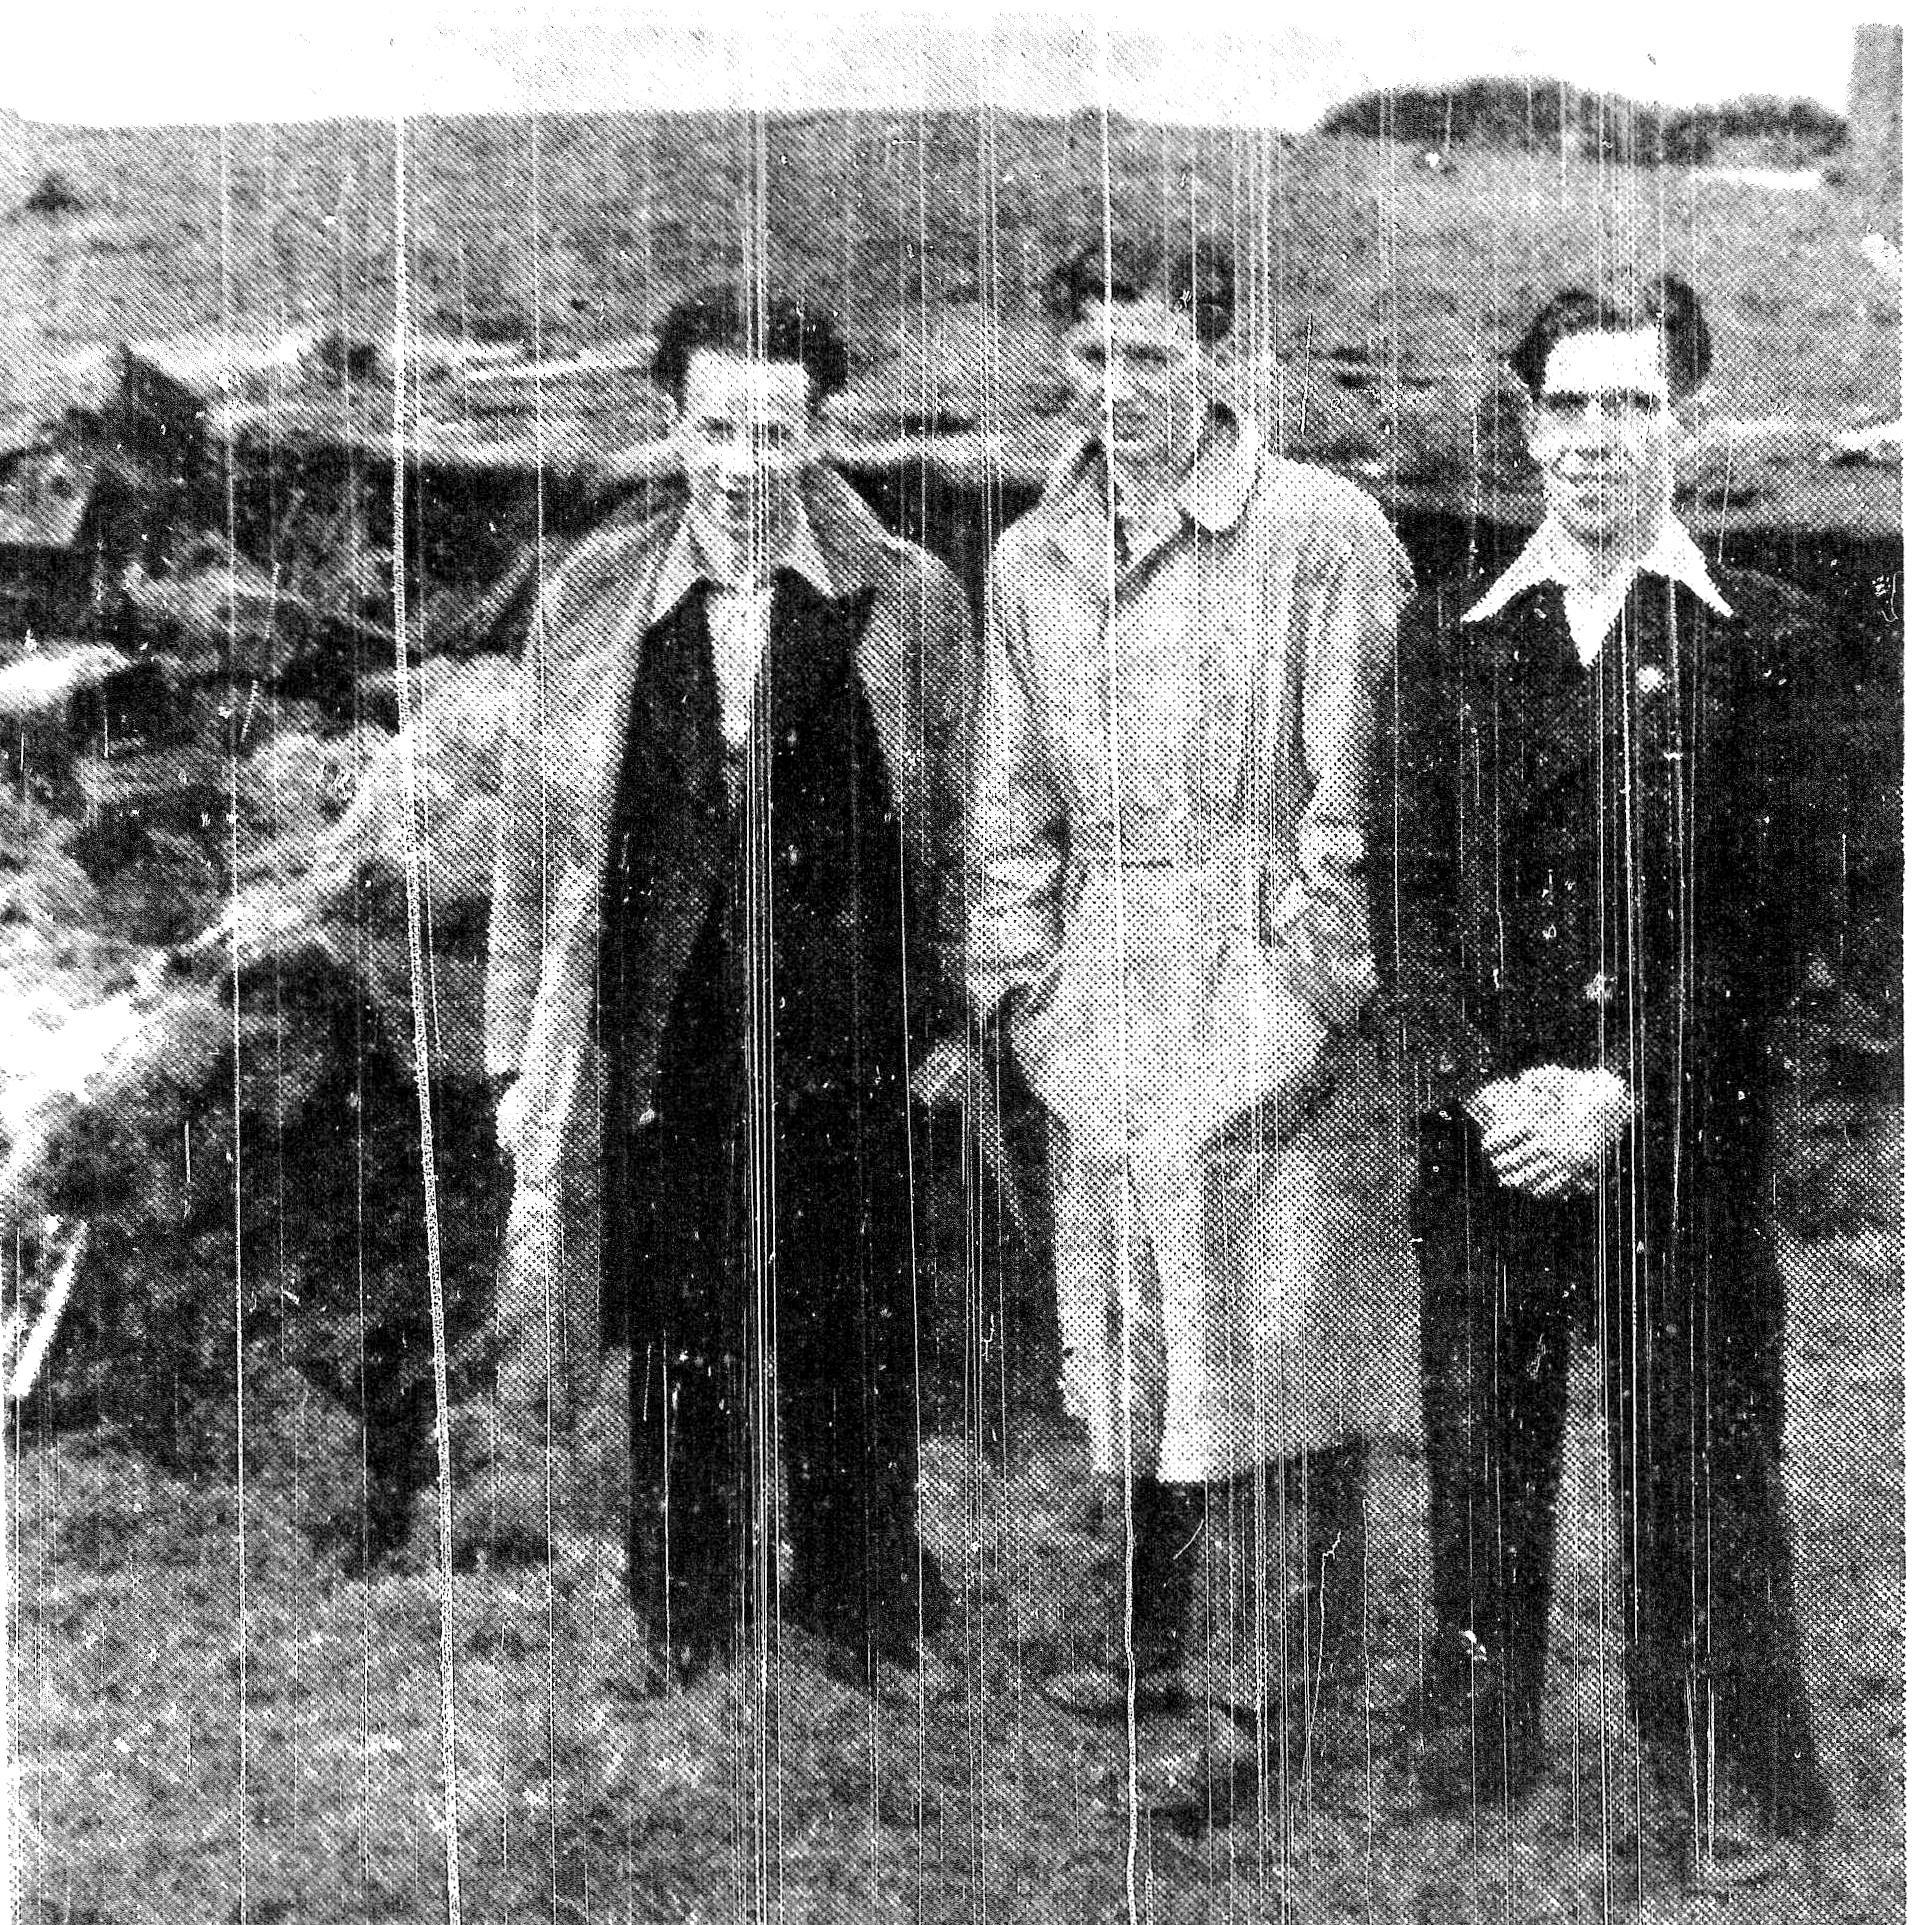 cumnock guys Boys' brigade 1st cumnock company the boys' brigade was formed in 1961 click here to access the boys' brigade website the company meets at the bb hall, millbank, cumnock.